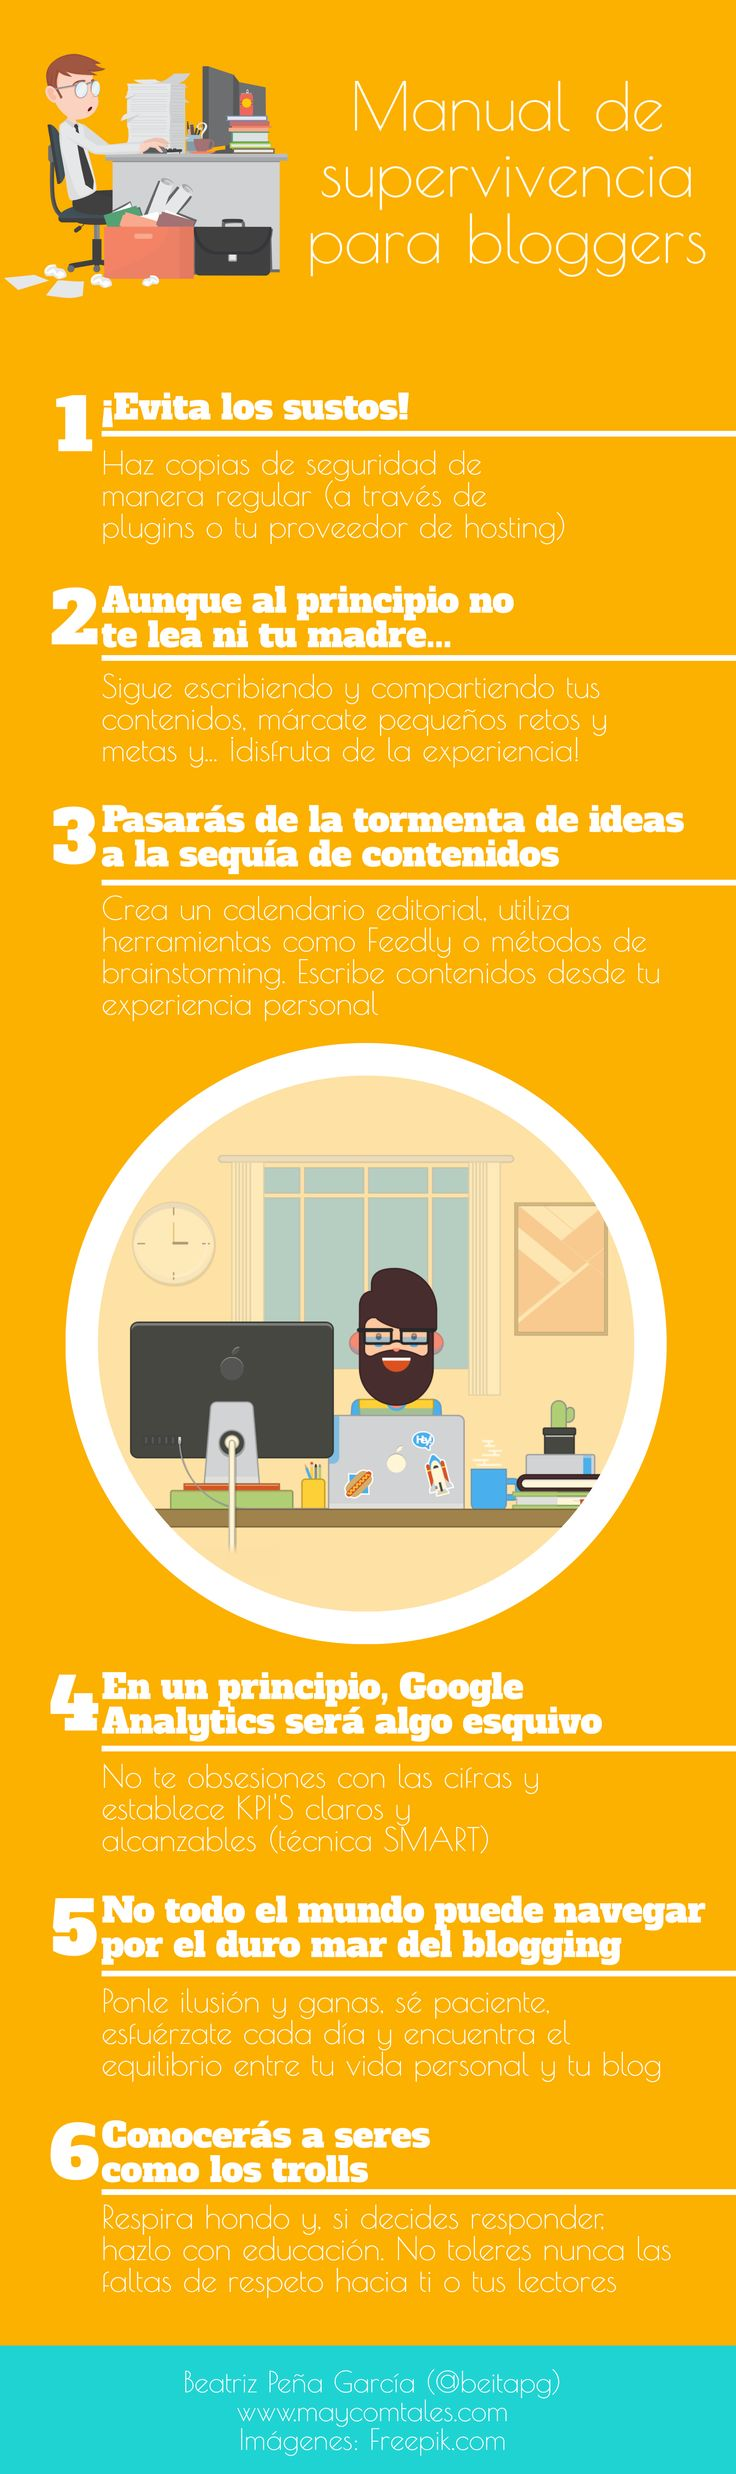 infografia_manual-supervivencia-bloggers